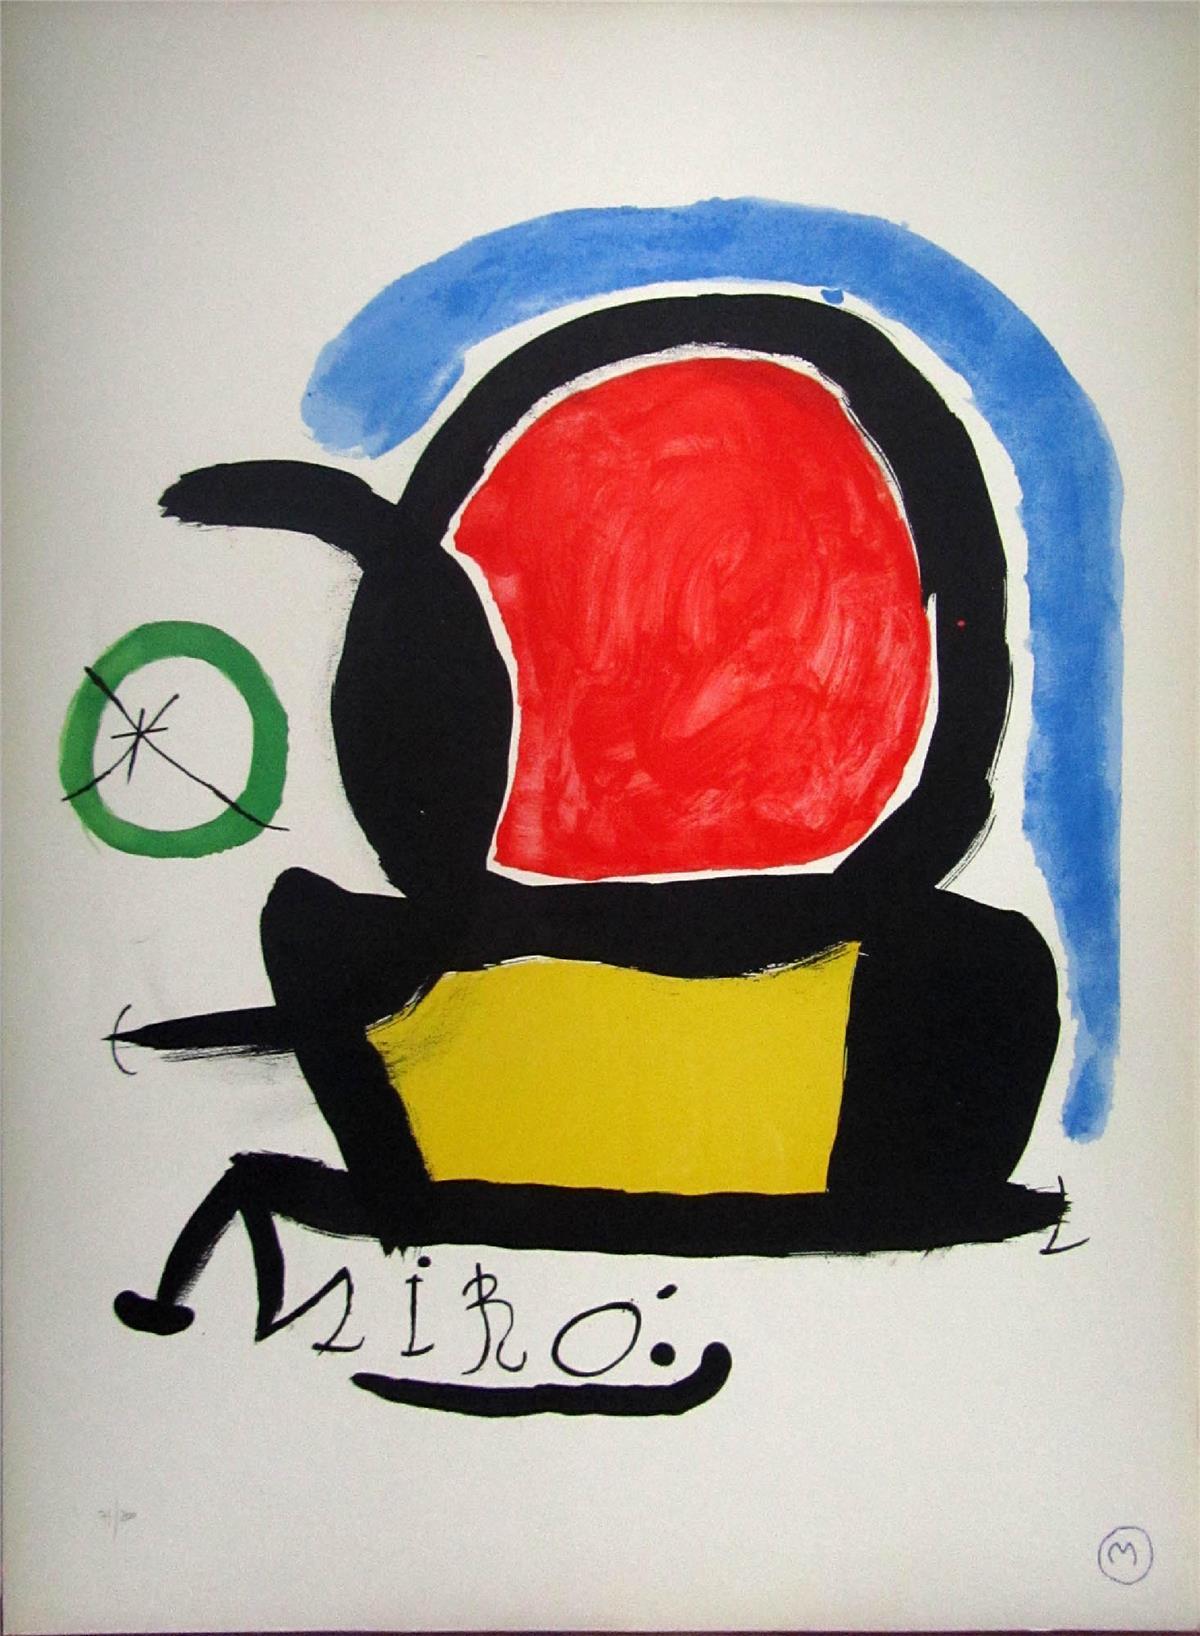 Subastas de arte en Artelista